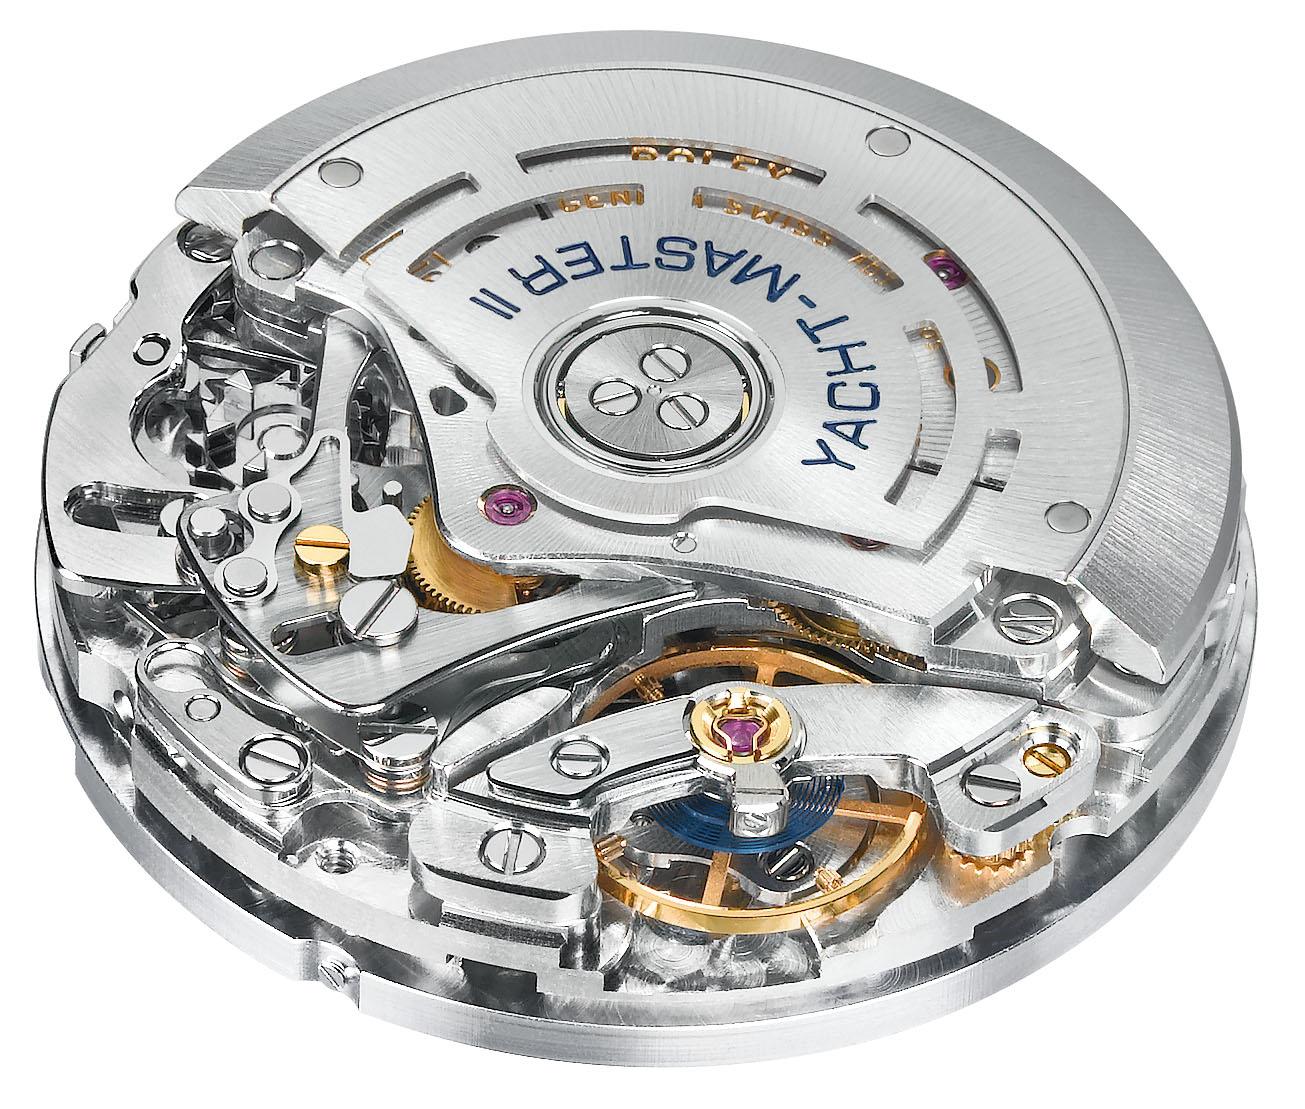 Watch Movement - Automatic - Rolex 4160